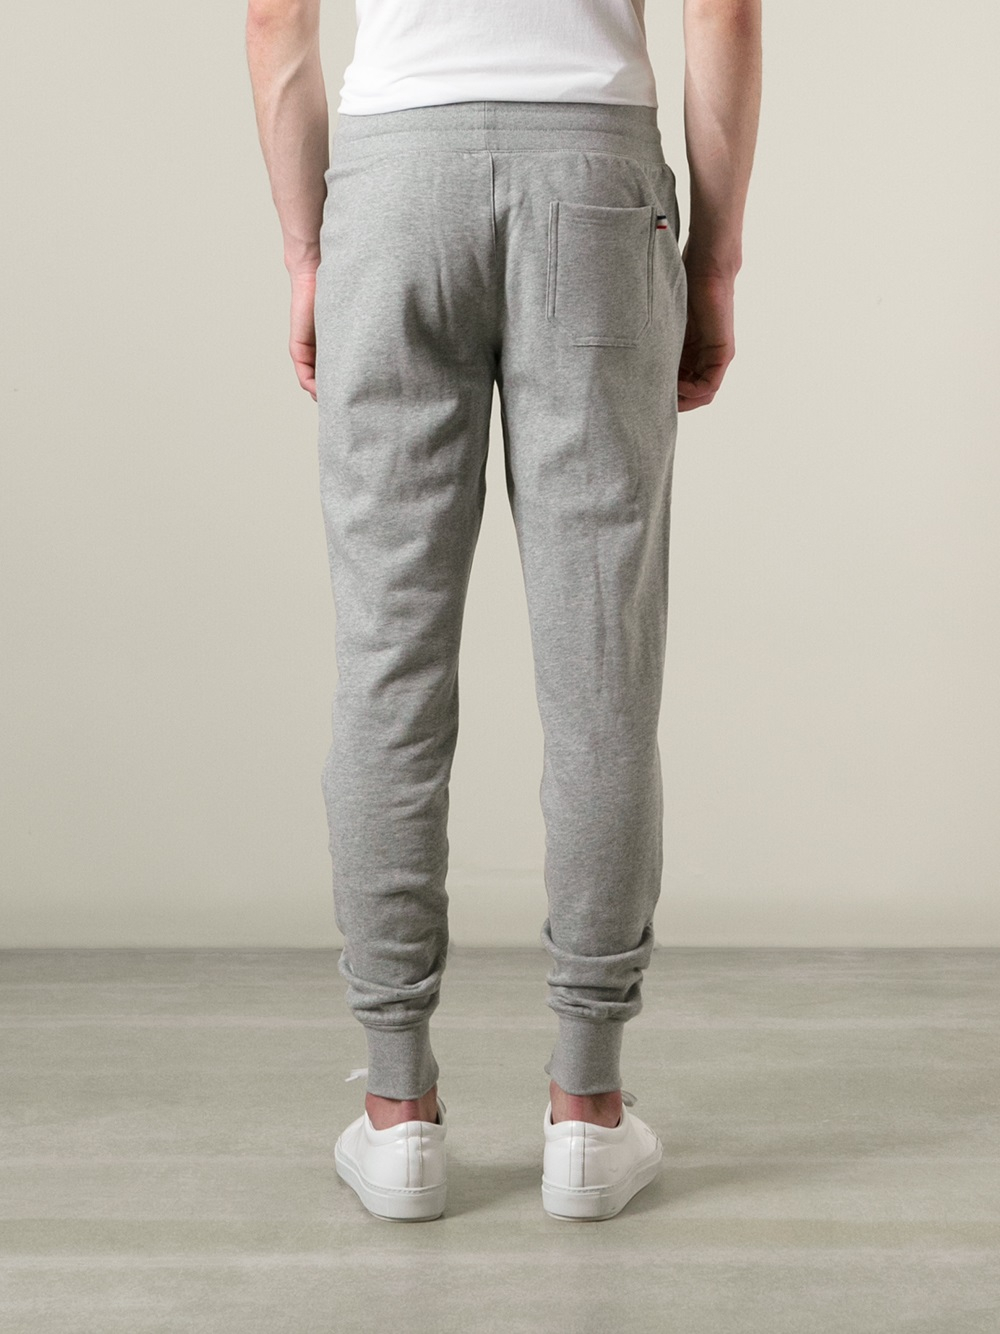 09c9e3c1de7d Moncler Tapered Track Pants in Gray for Men - Lyst